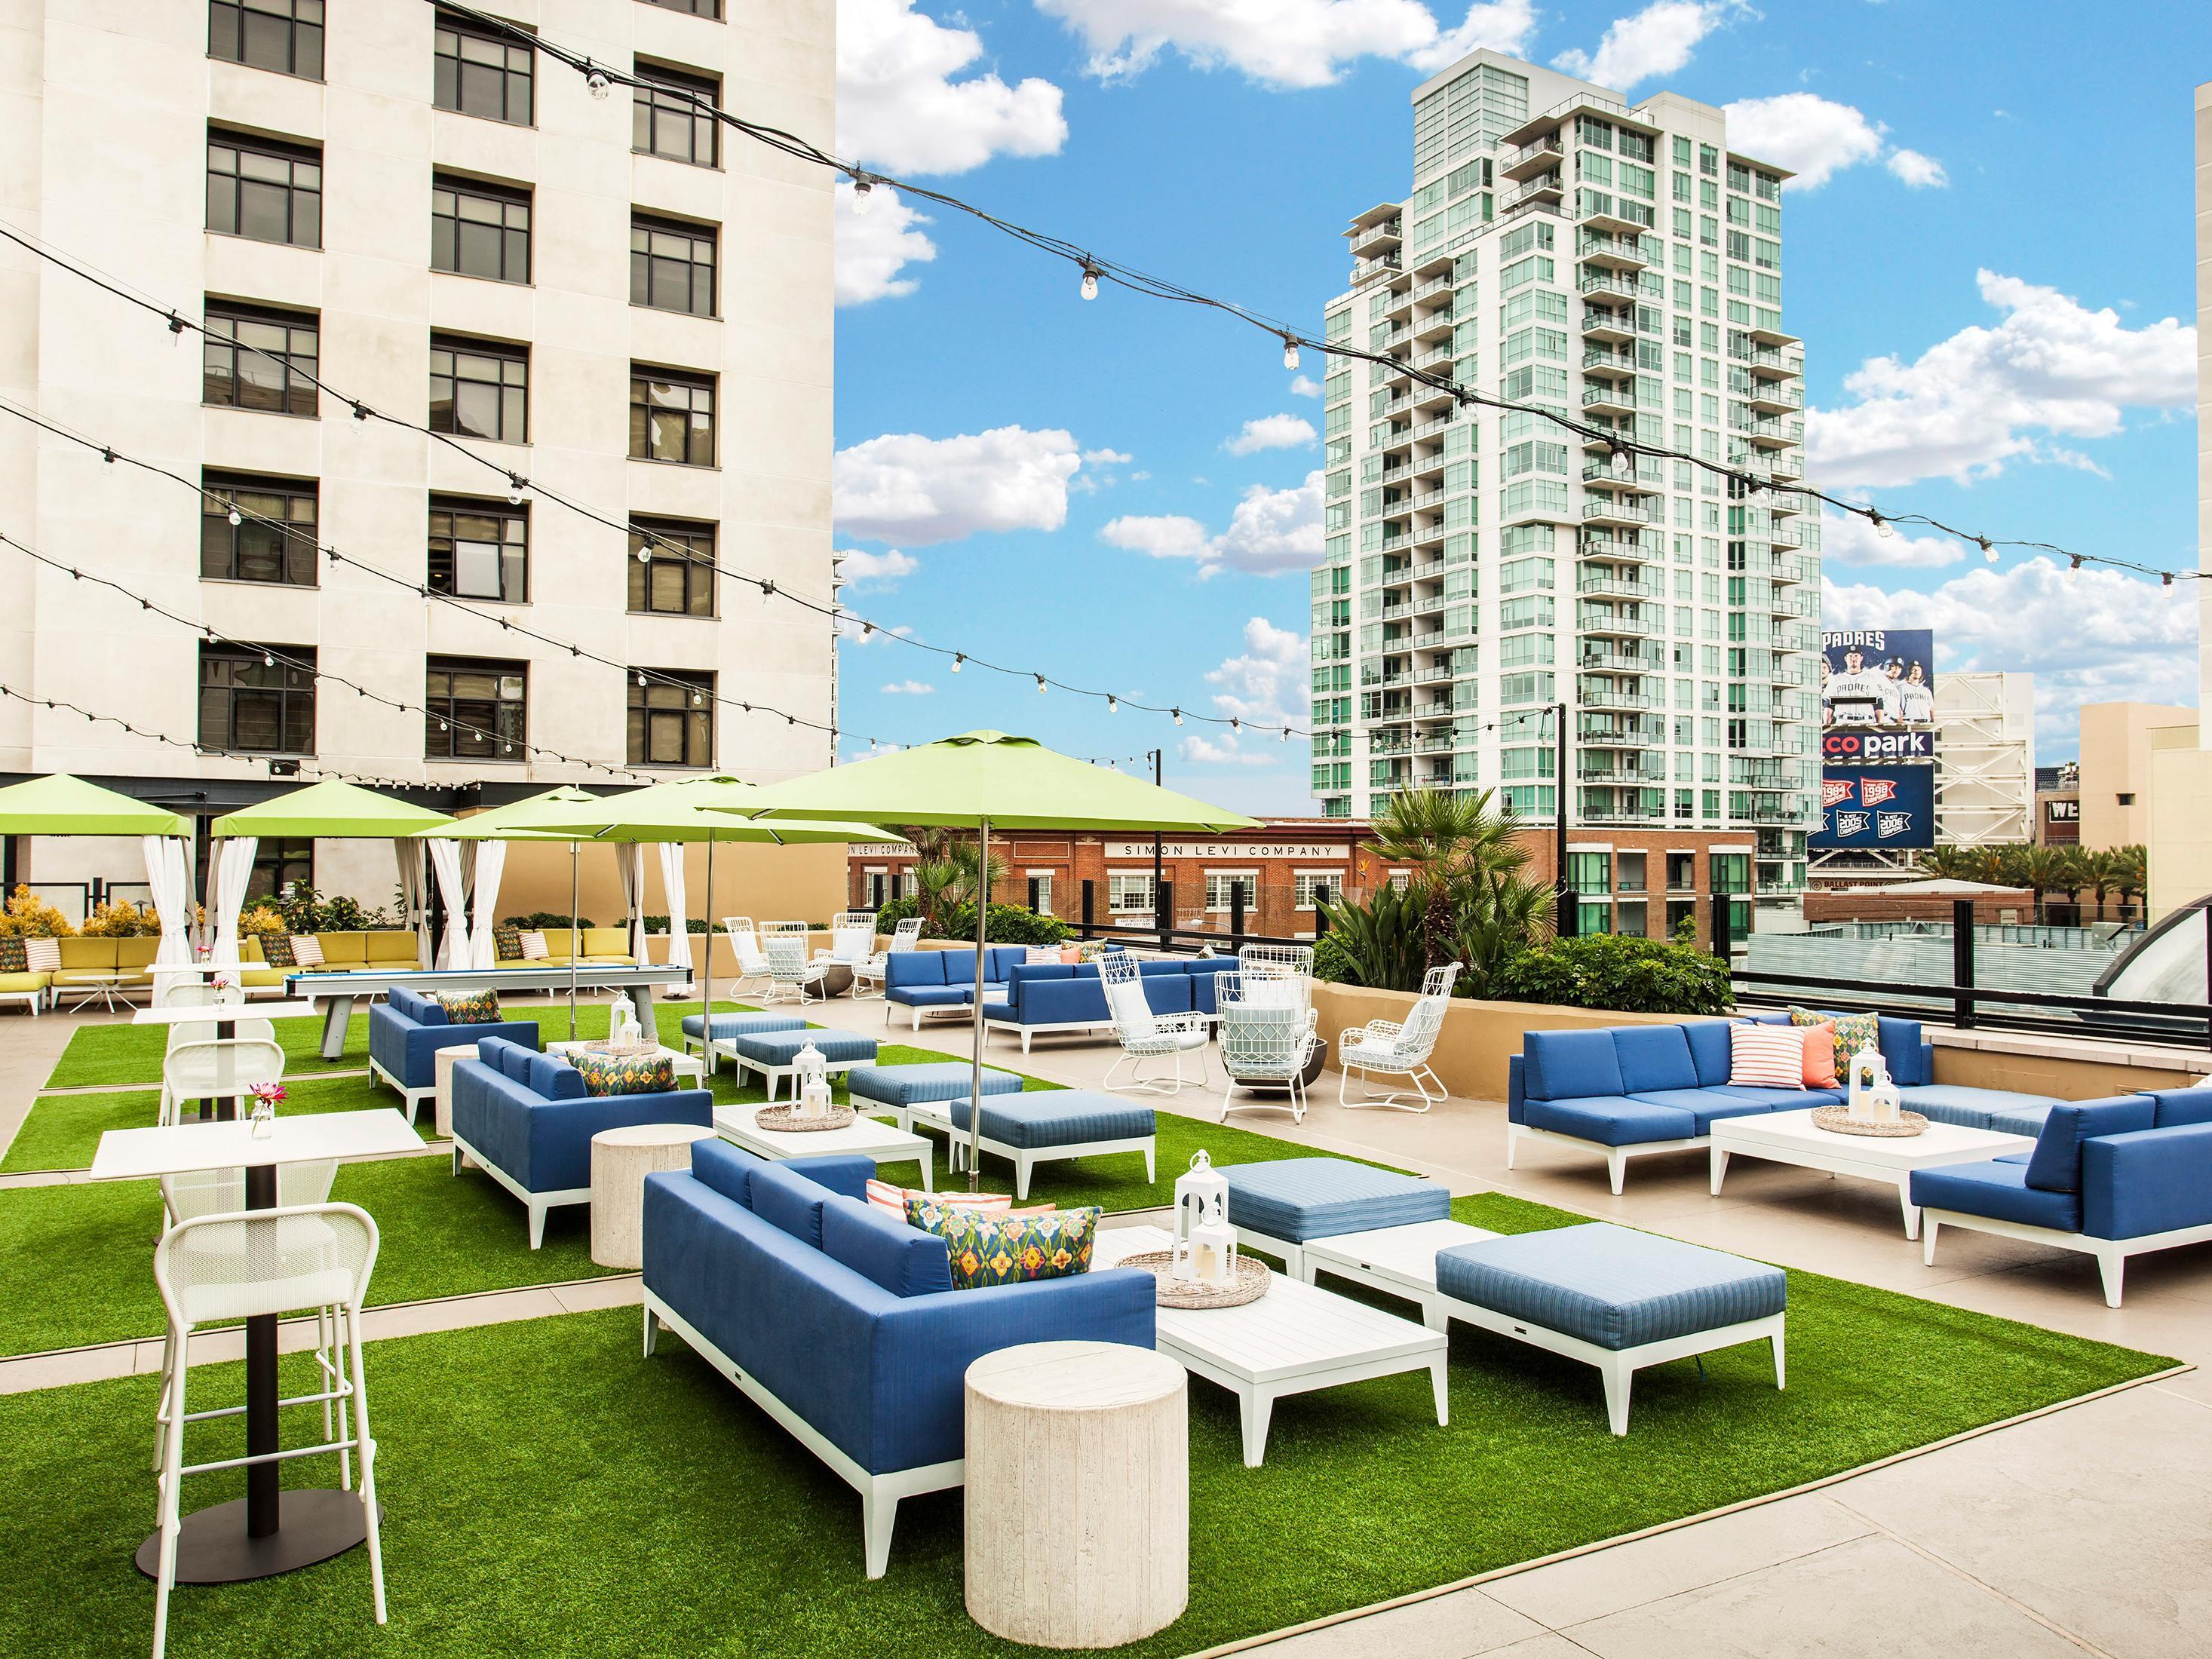 Hotels In San Diego >> Kimpton Solamar Hotel In Downtown San Diego Kimpton Hotels